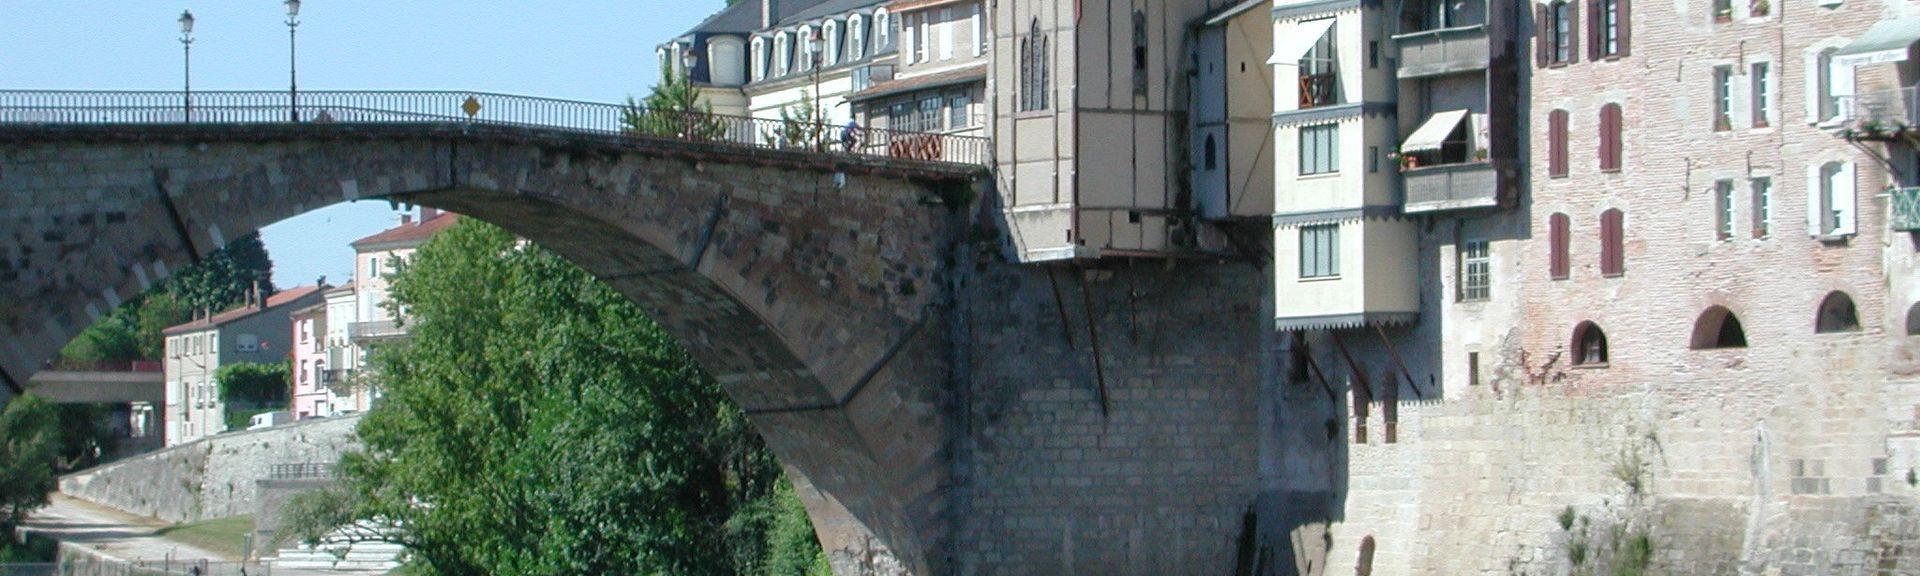 Verteuil-d'Agenais, France